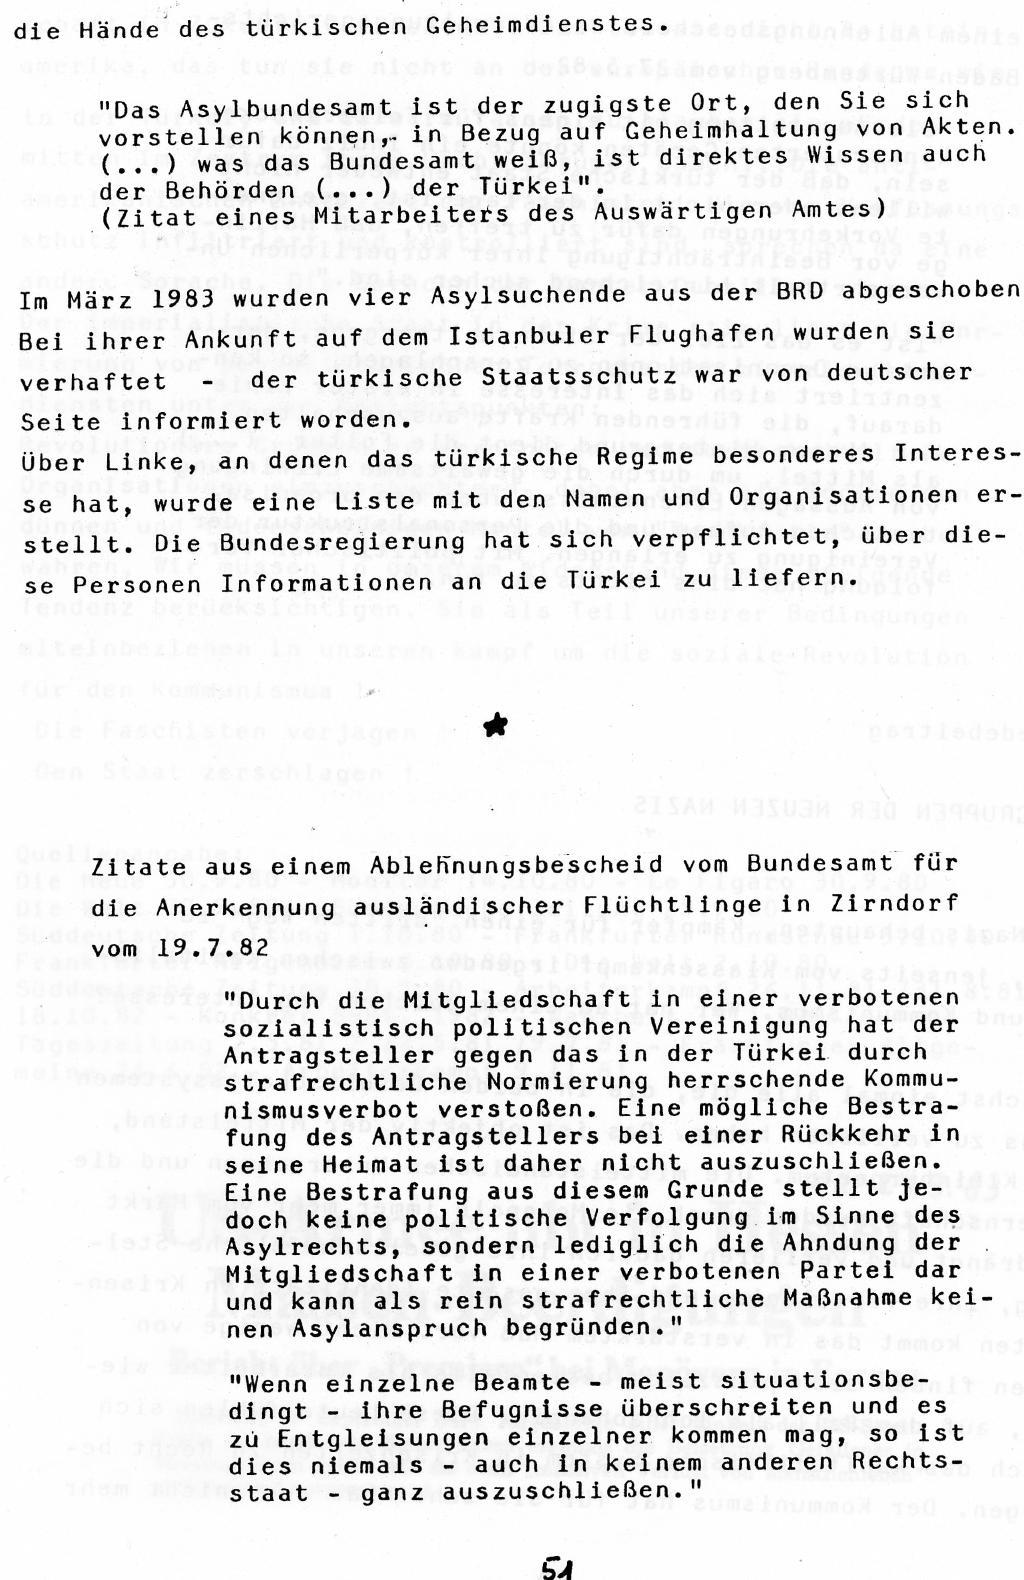 Berlin_1983_Autonome_Gruppen_Faschismus_im_Kapitalismus_51